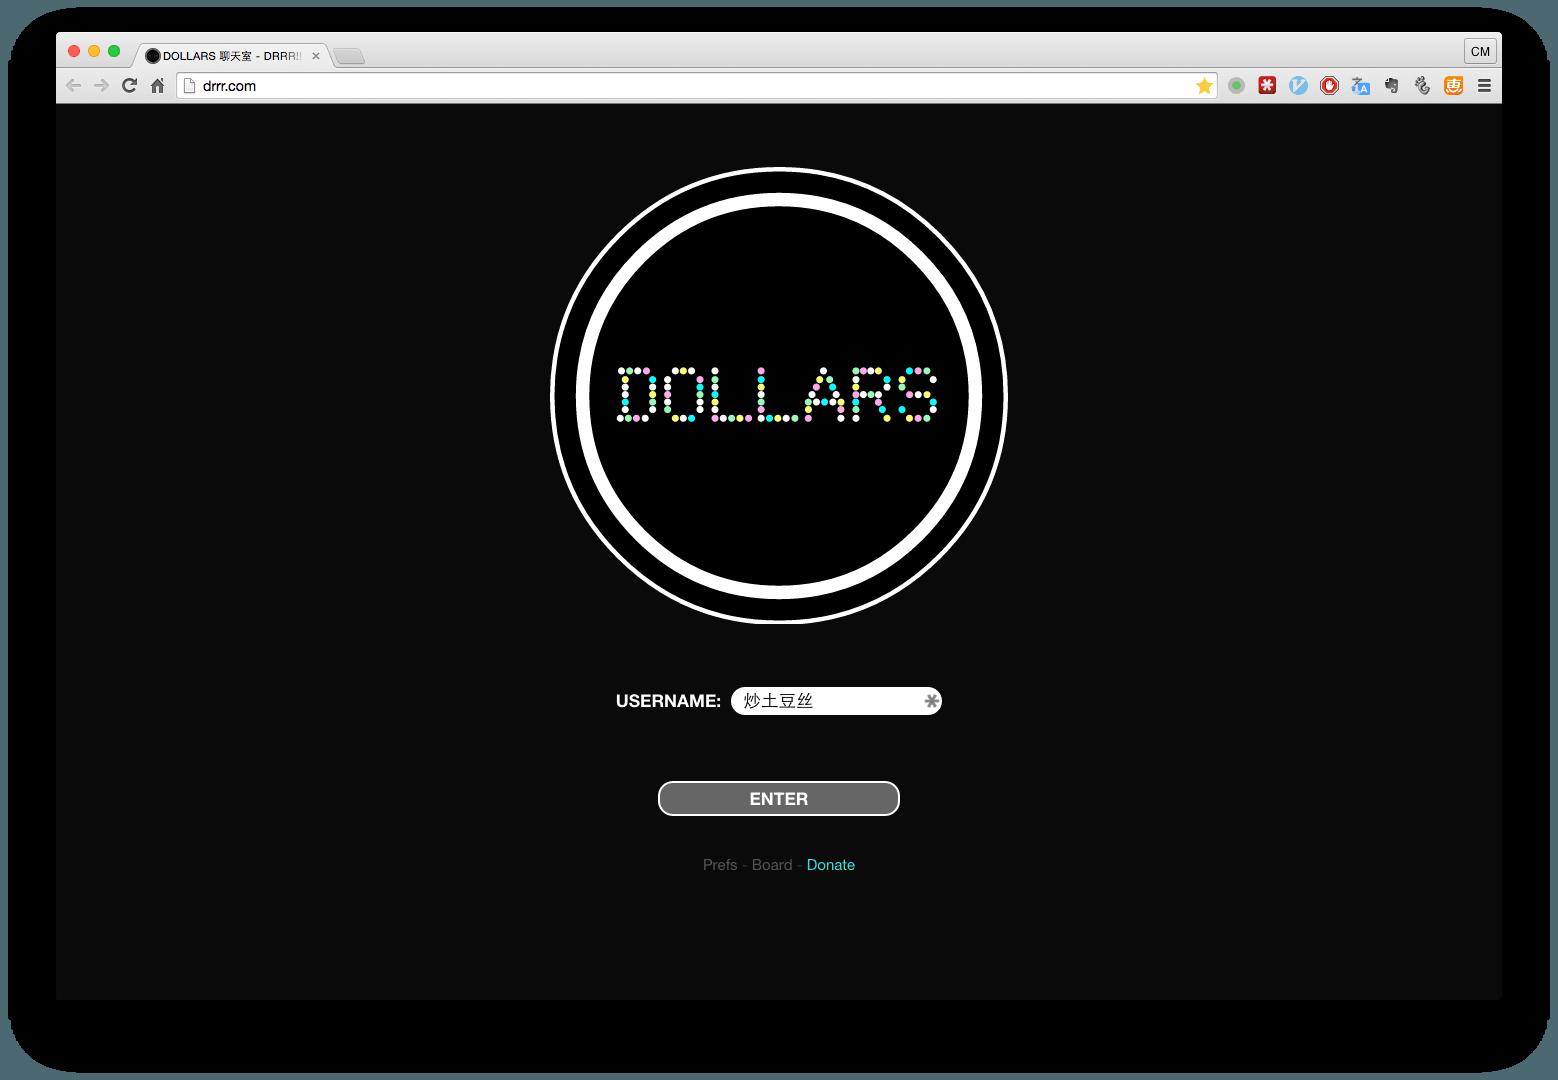 dollars-1